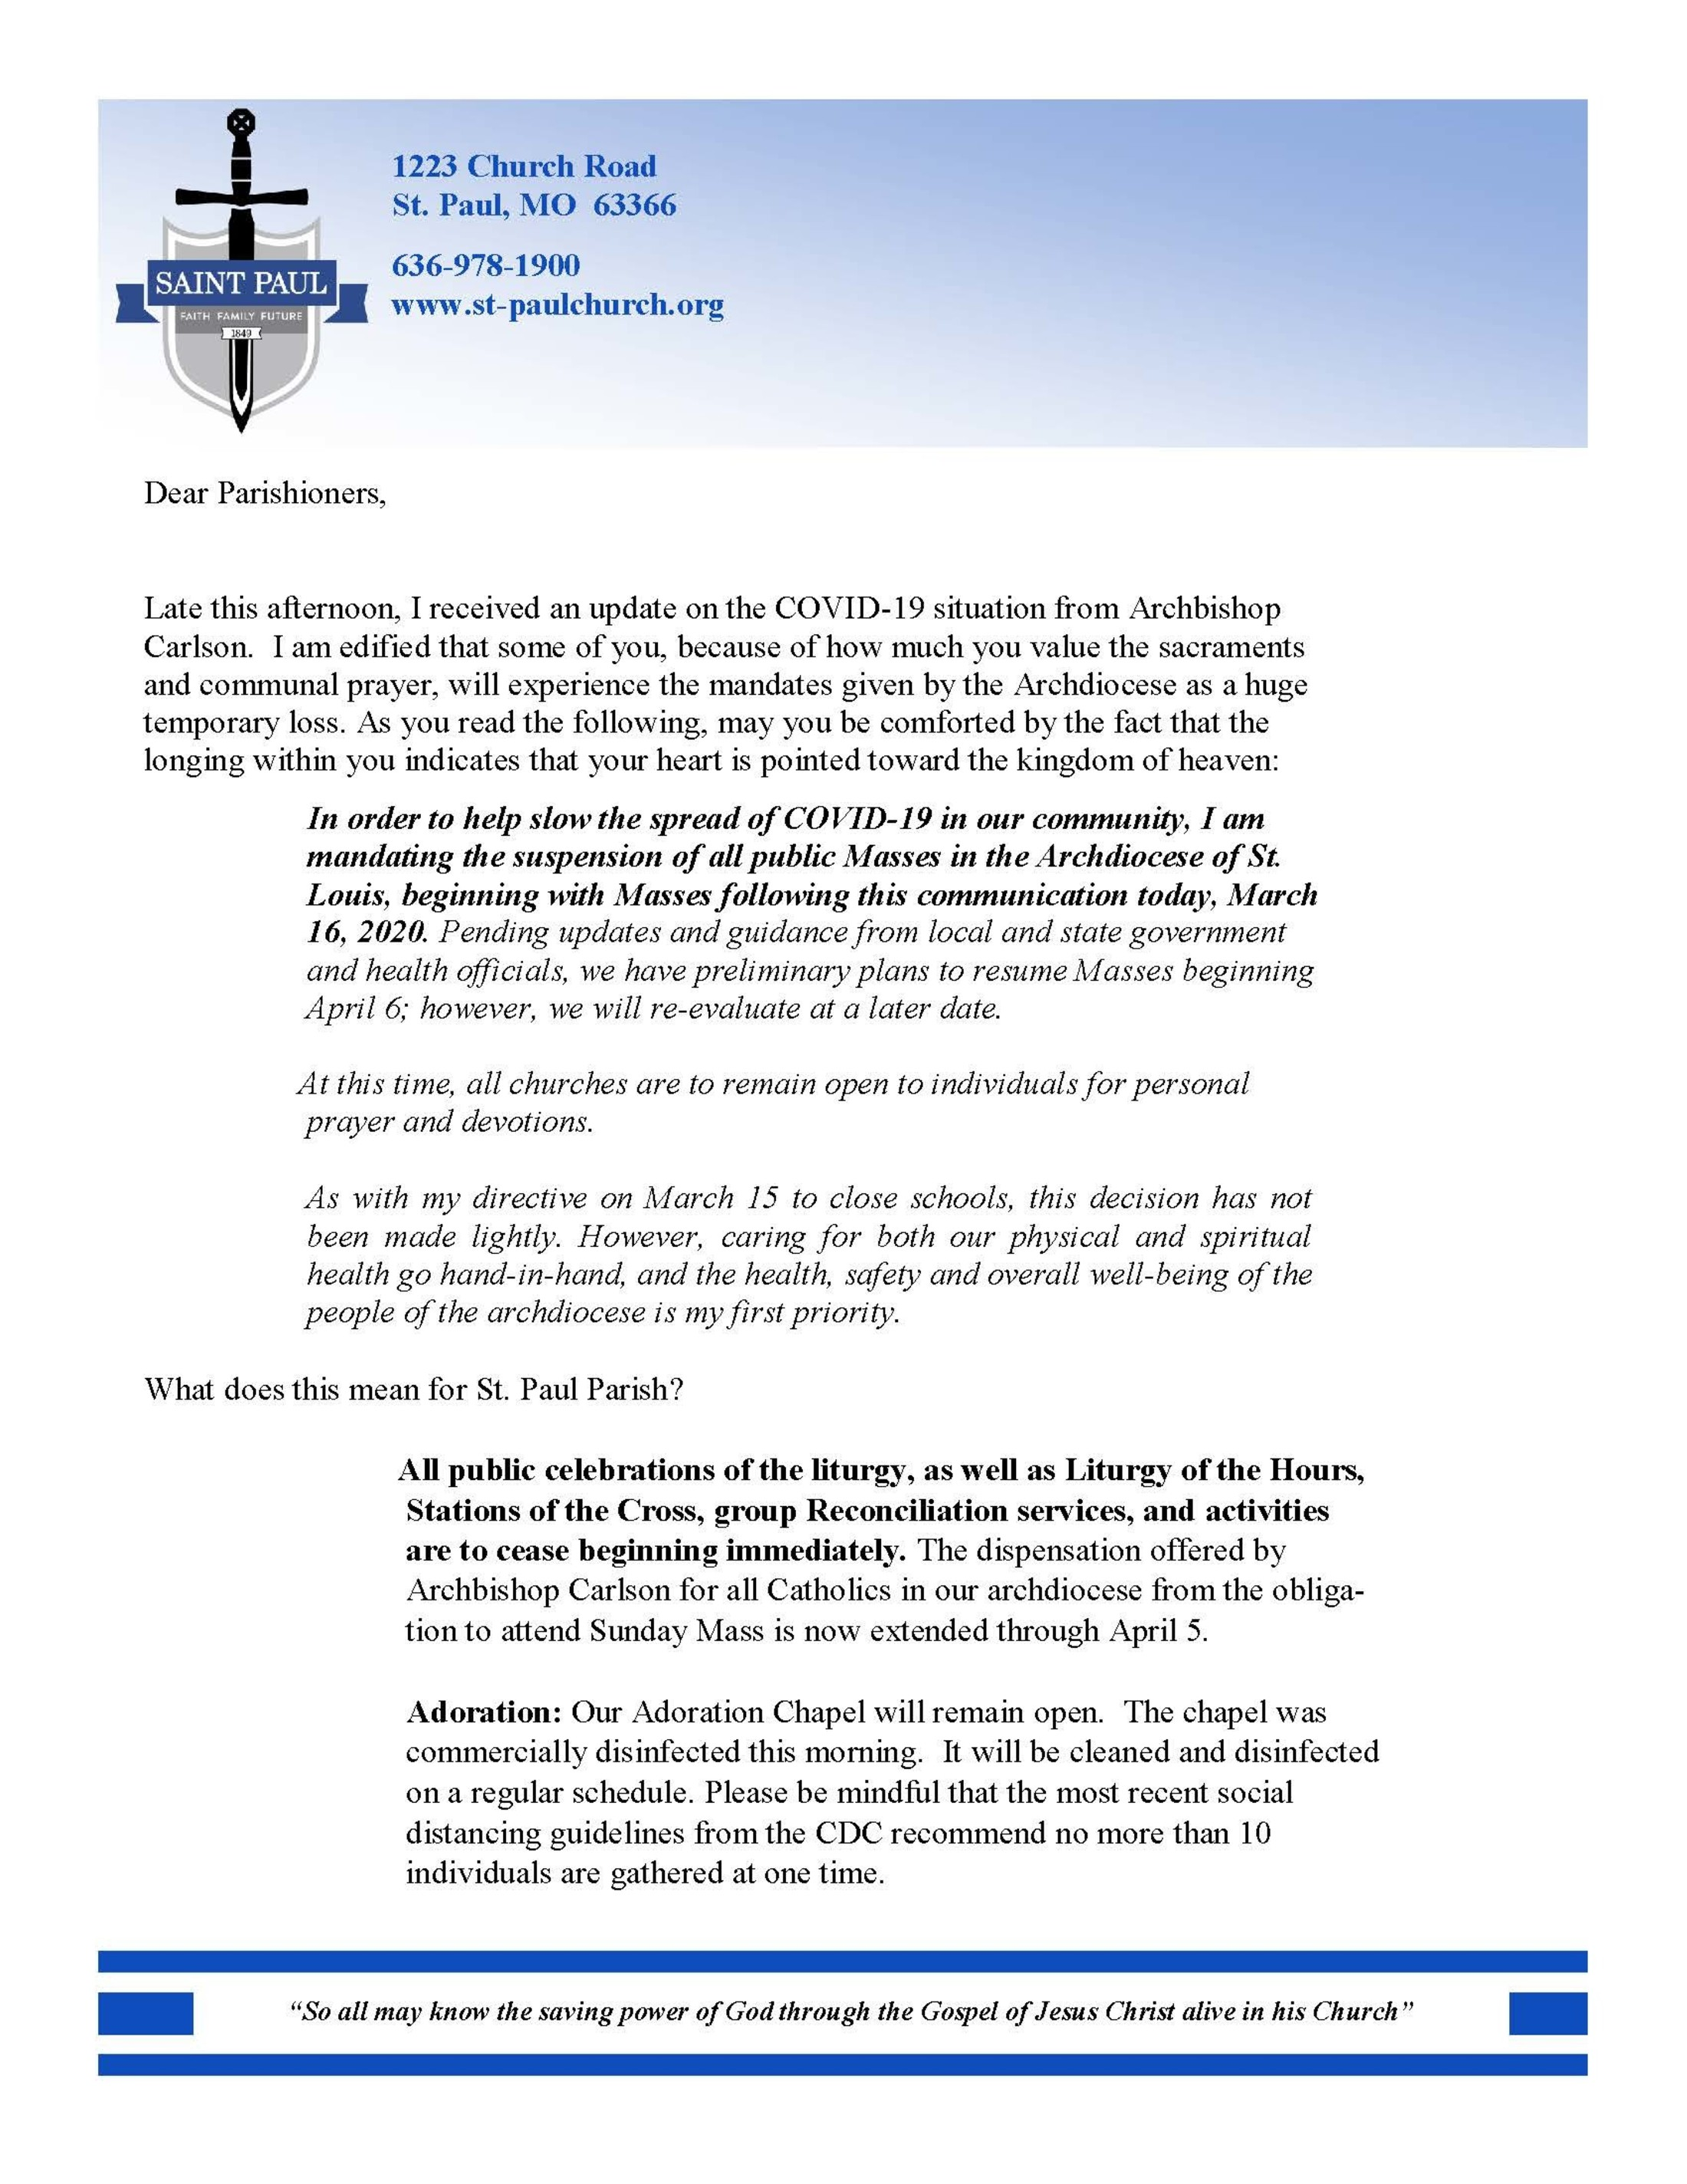 Coronavirus Letter To Parishioners Mar2020 Page 1